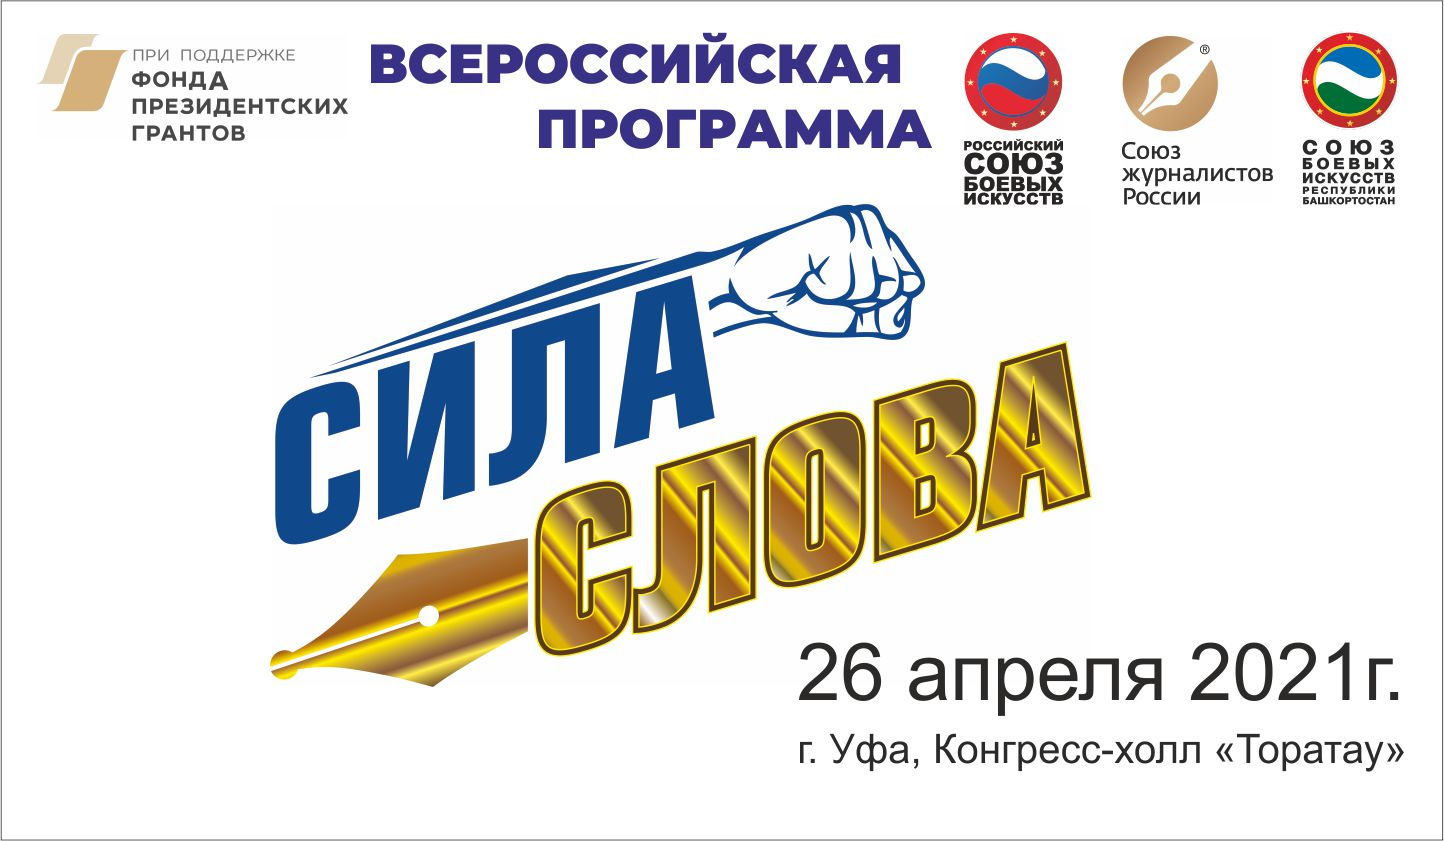 http://sbirb.combatsd.ru/images/upload/Сила_слова%20афиша.jpg